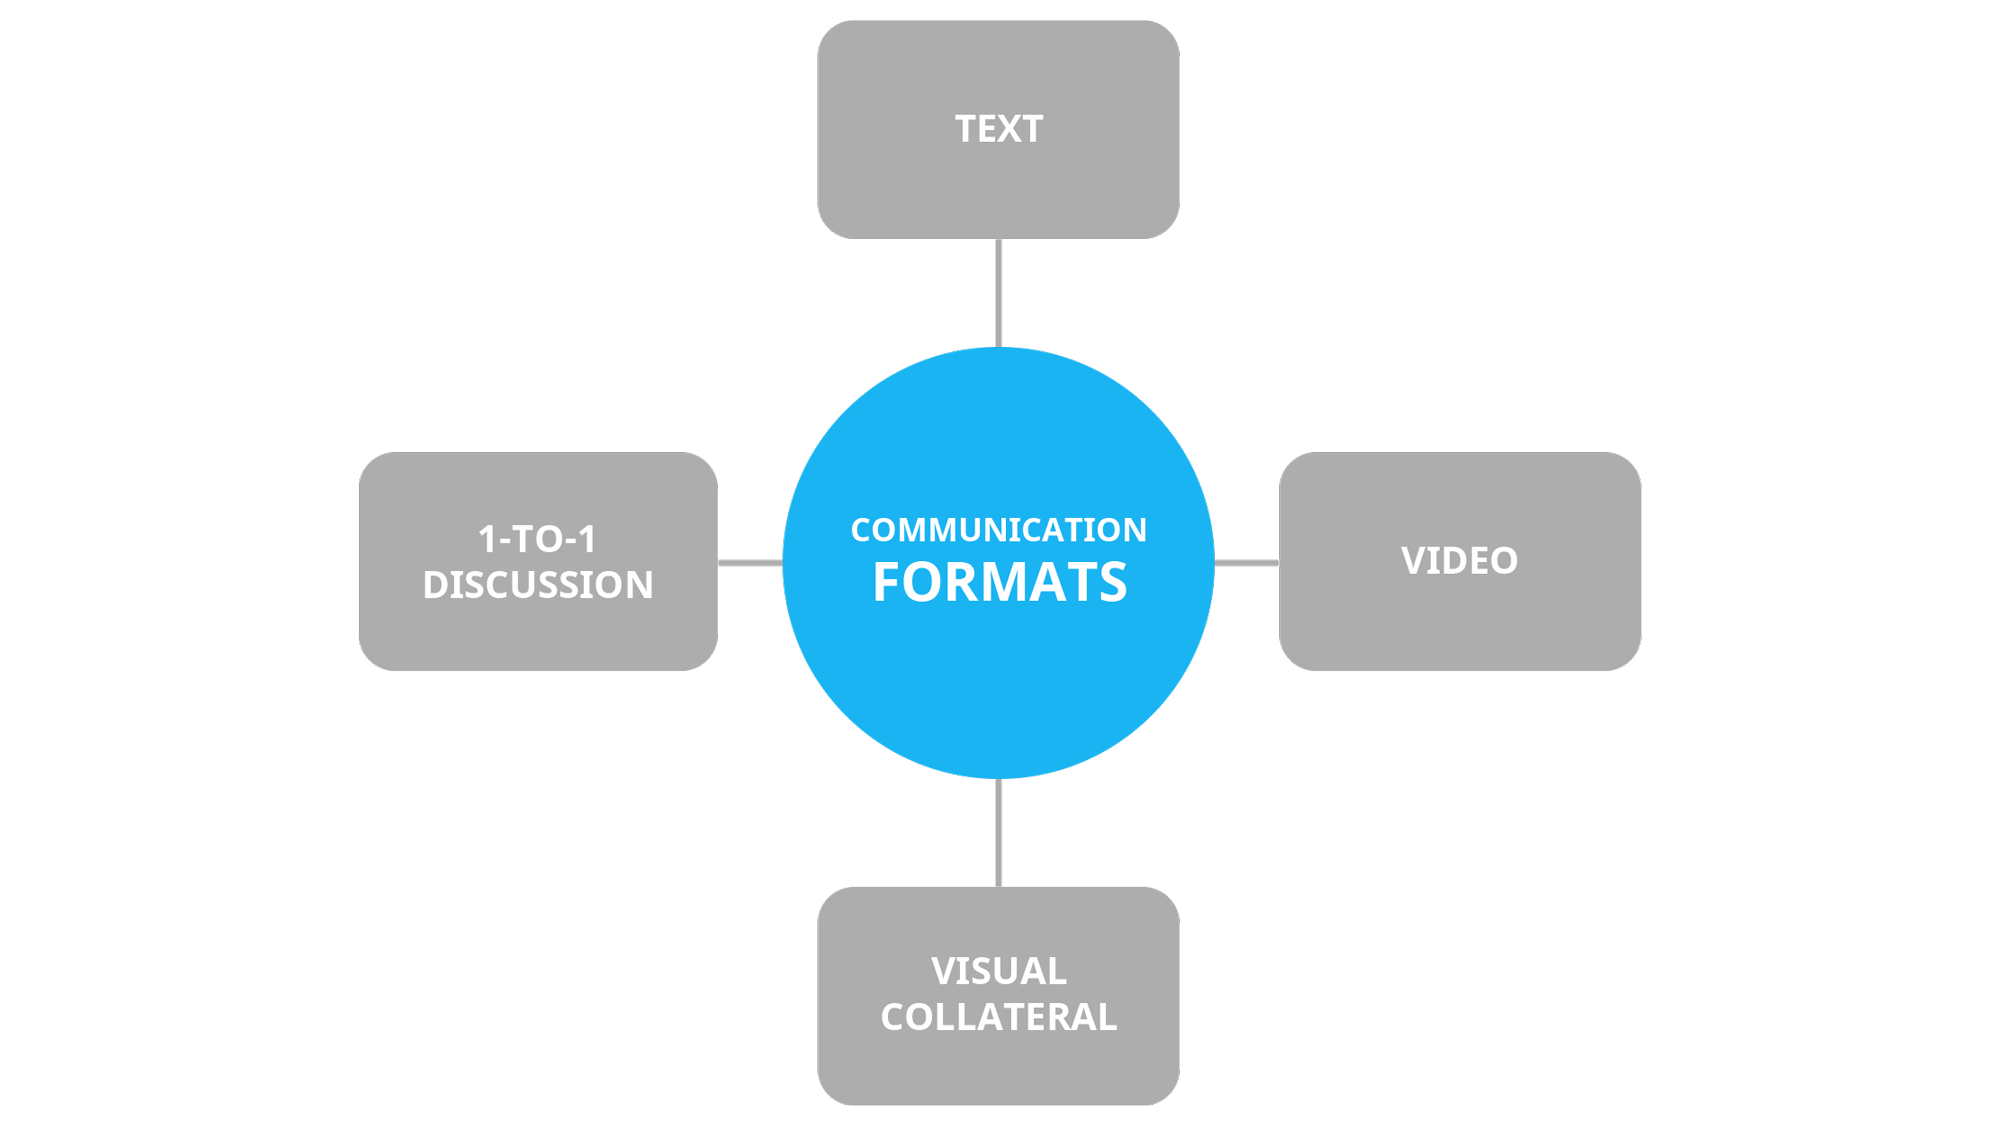 Common communication formats for innovation programs